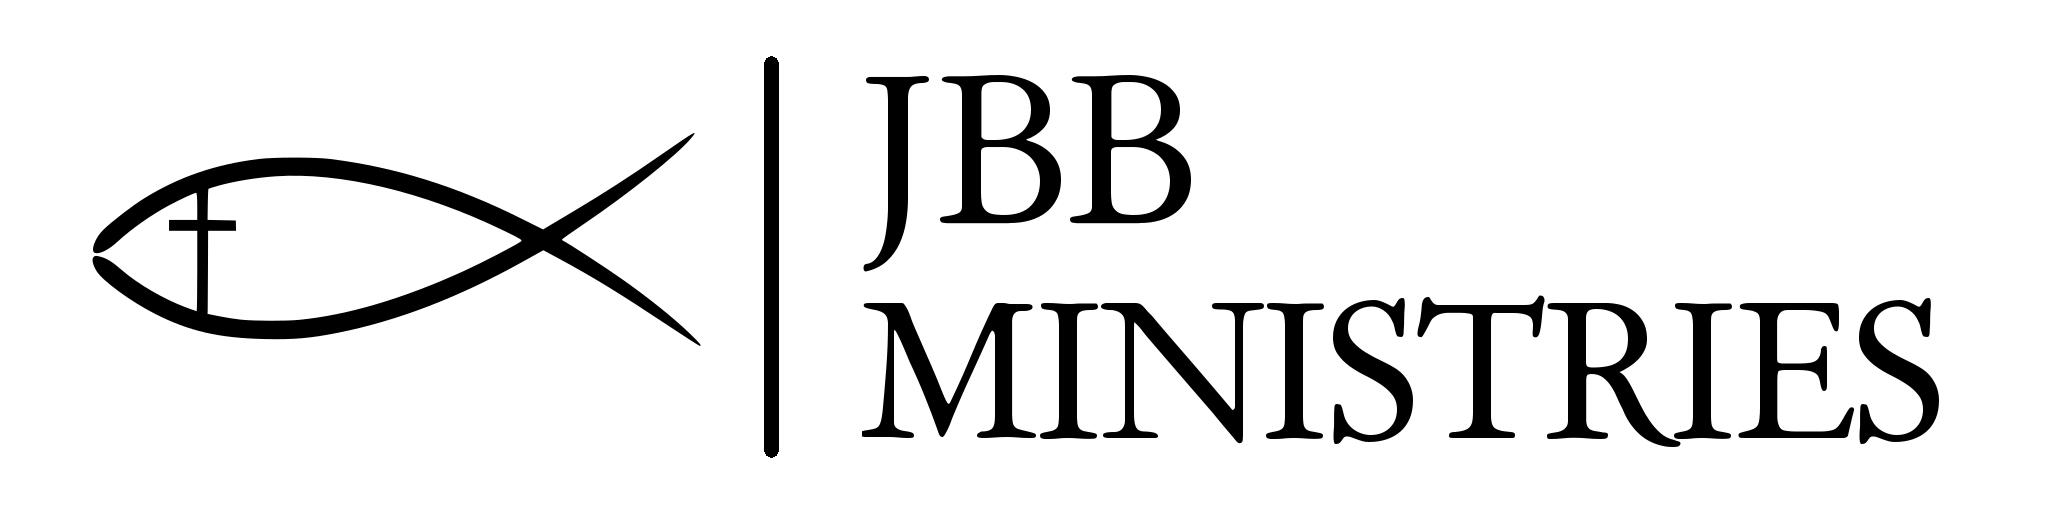 JBB Ministries logo